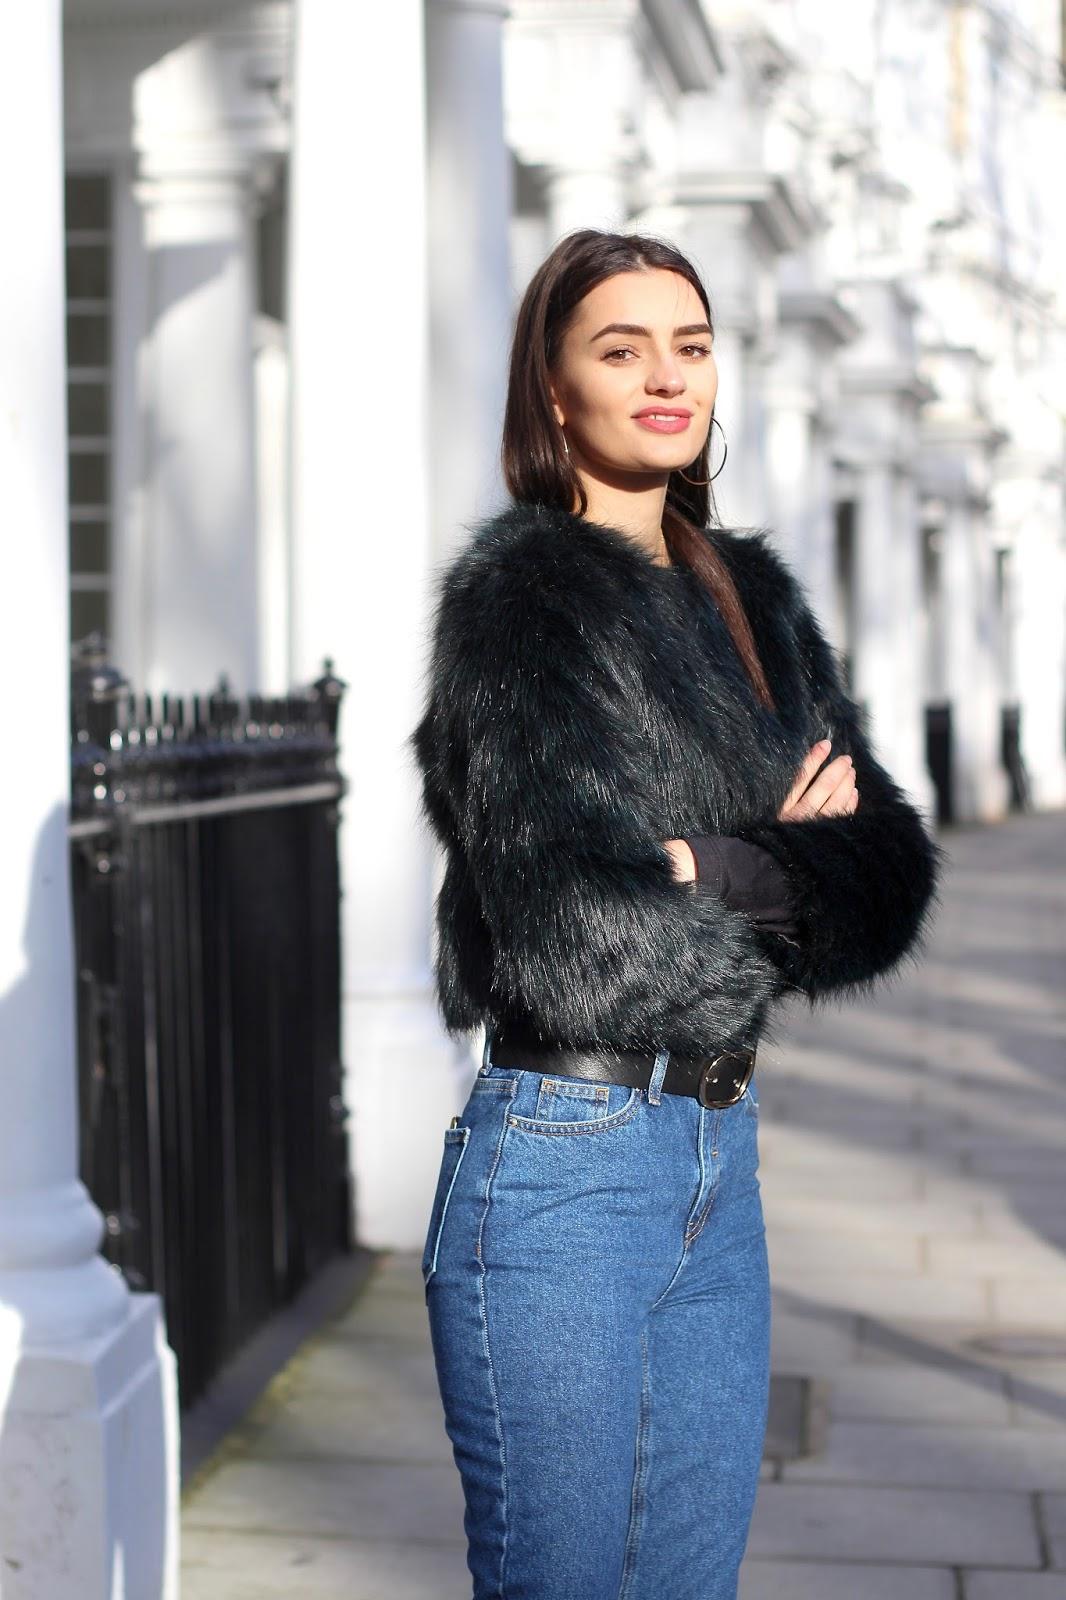 peexo personal style london fashion blog